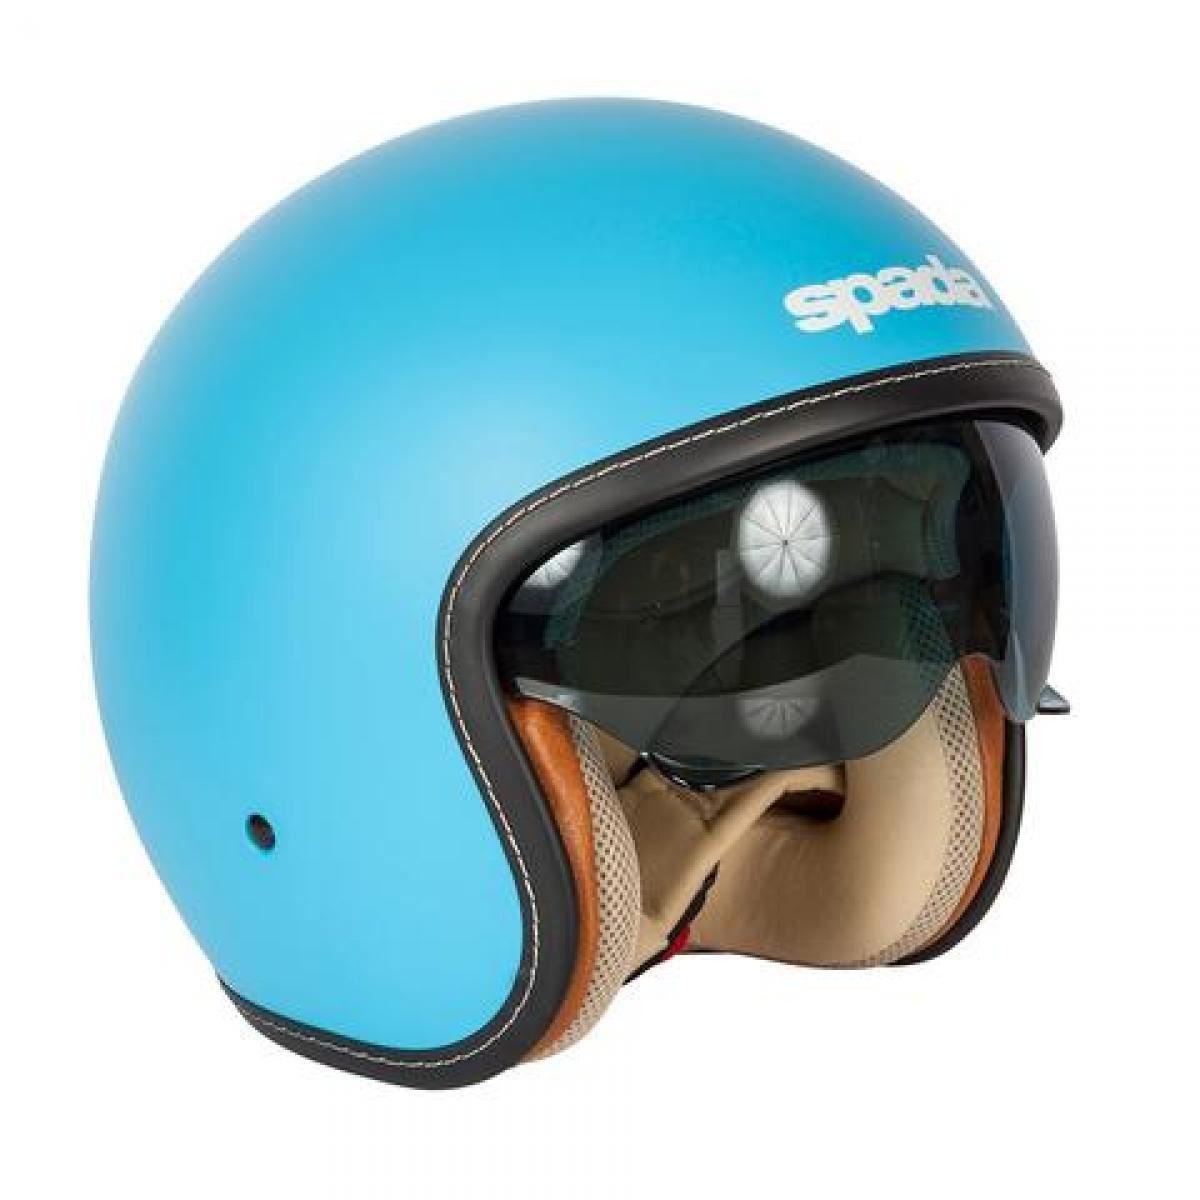 Spada-Raze-Ouvert-Casque-Bleu-Integre-Visiere miniature 16